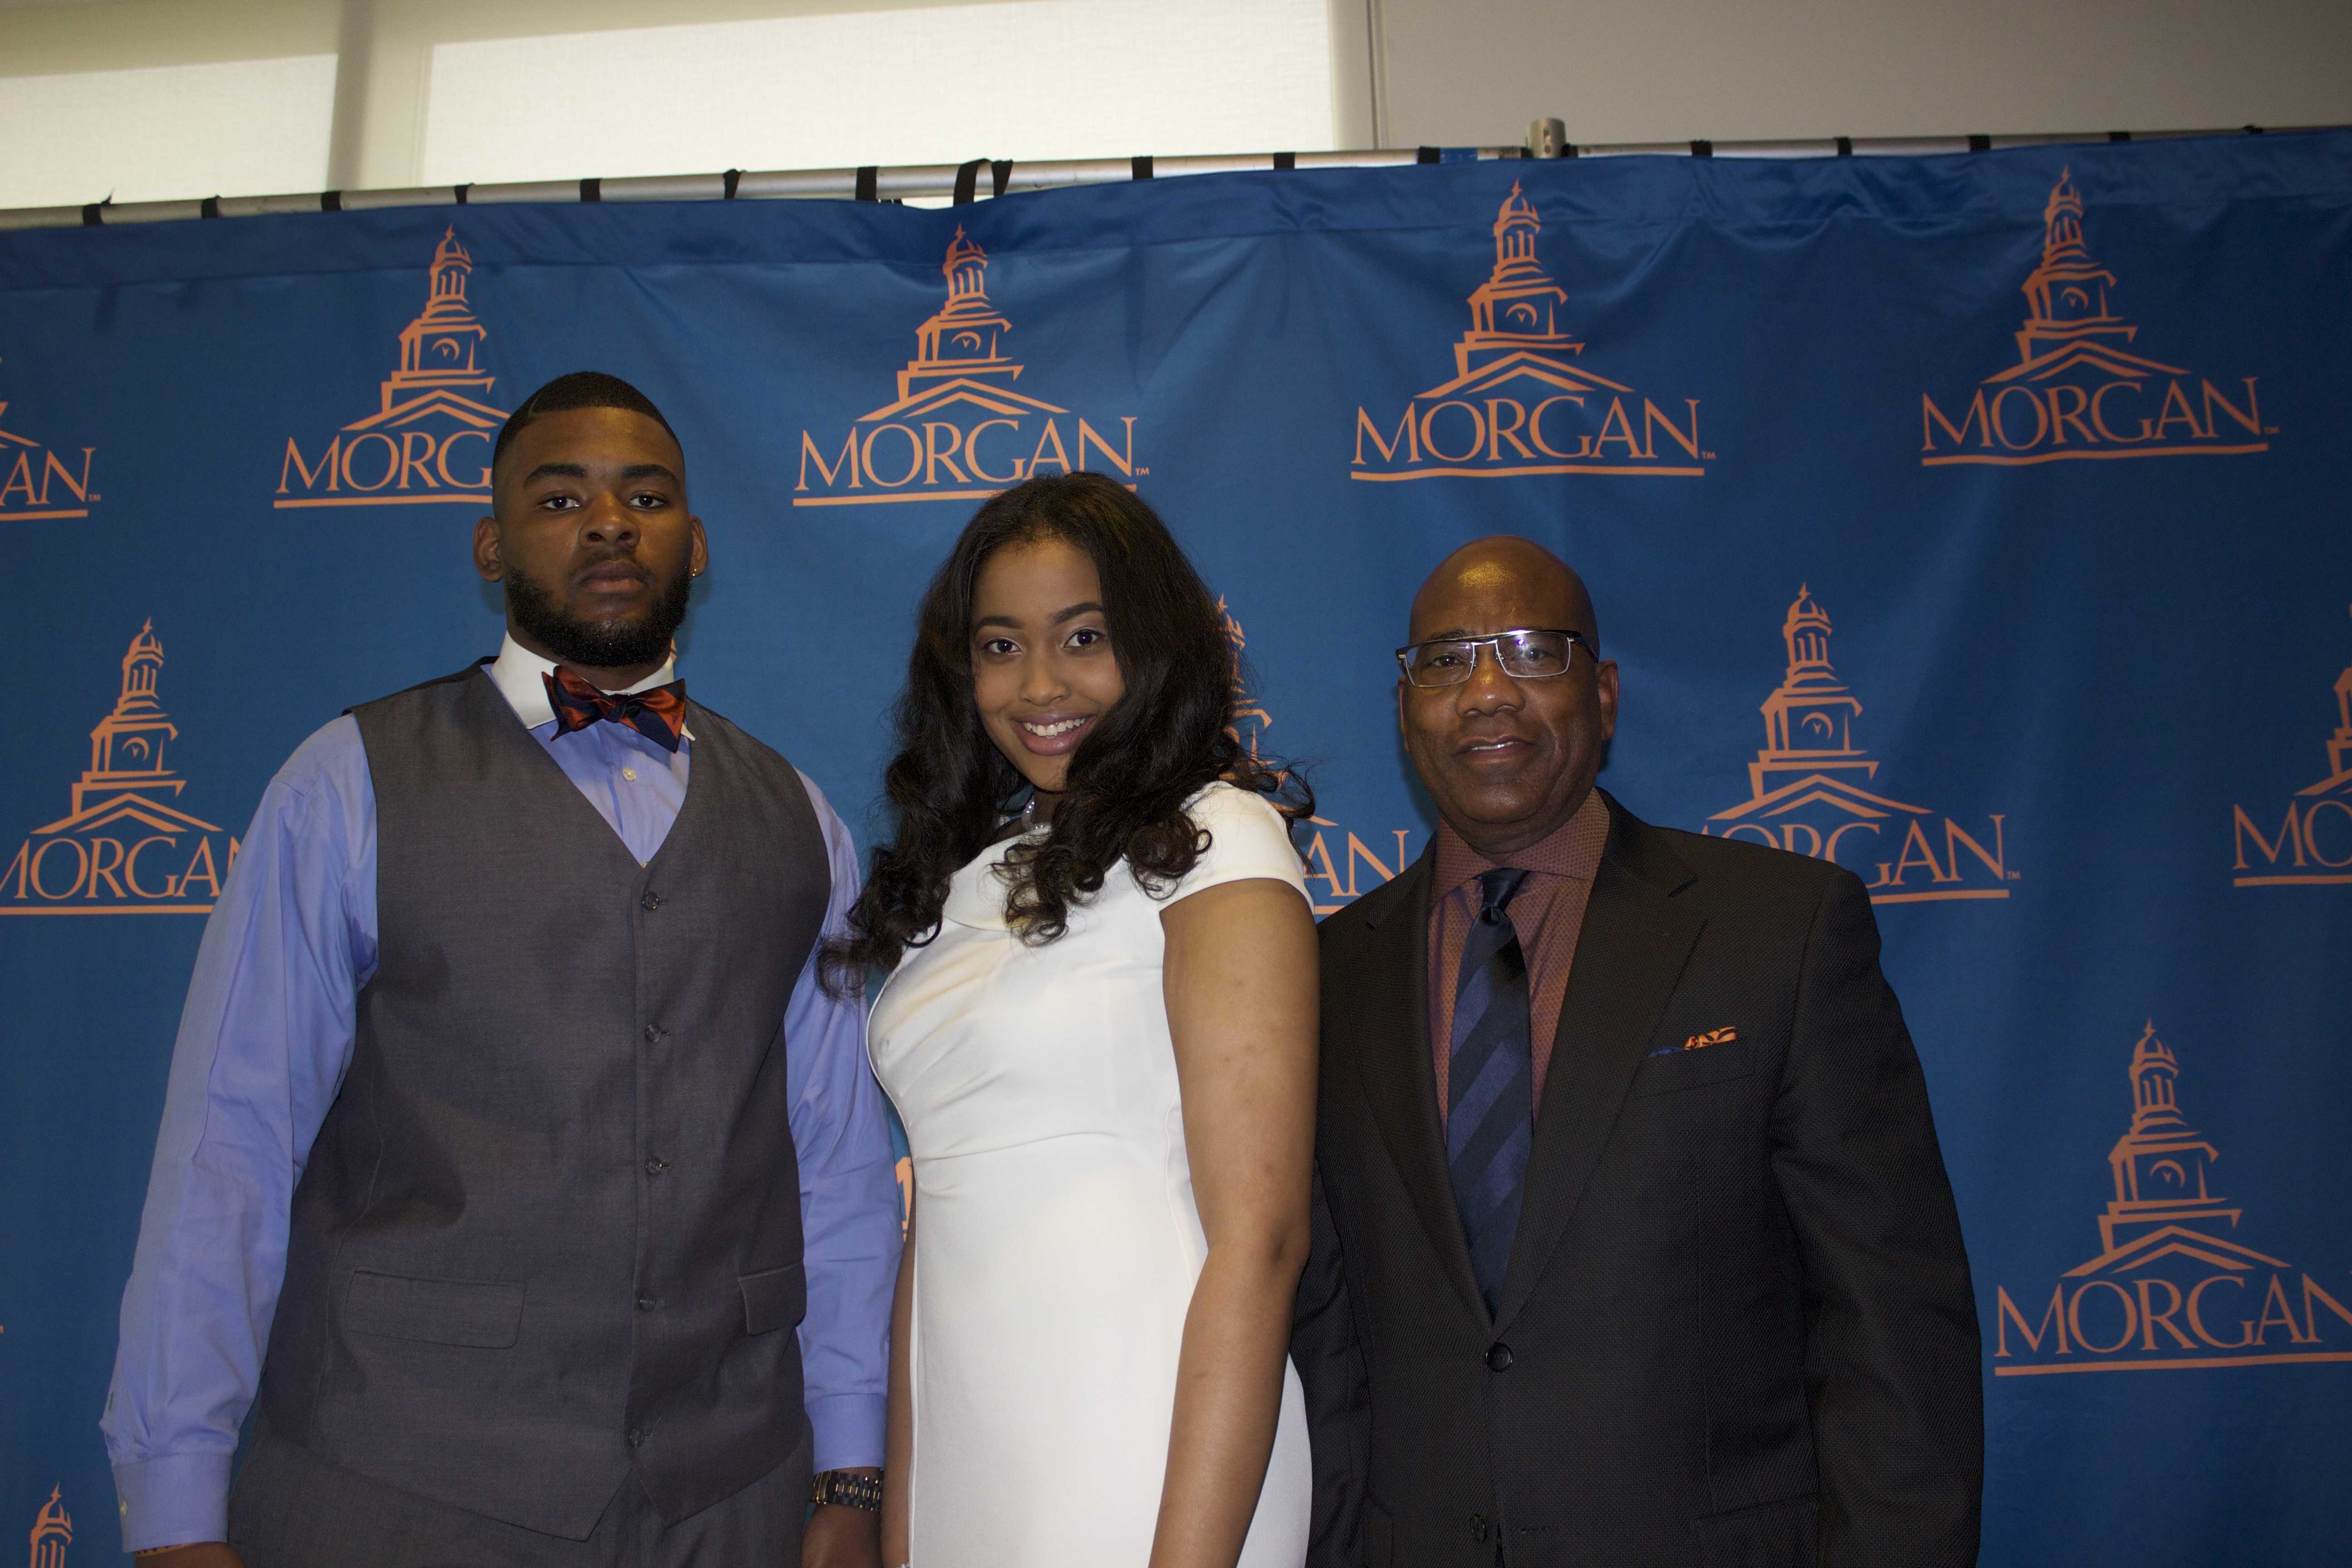 (Left to Right) Mr. Morgan Andrew Mitchell; Miss Morgan Chelsea T. Johnson; MSU President David Wilson. Photo credit: Tramon Lucas, Managing Editor